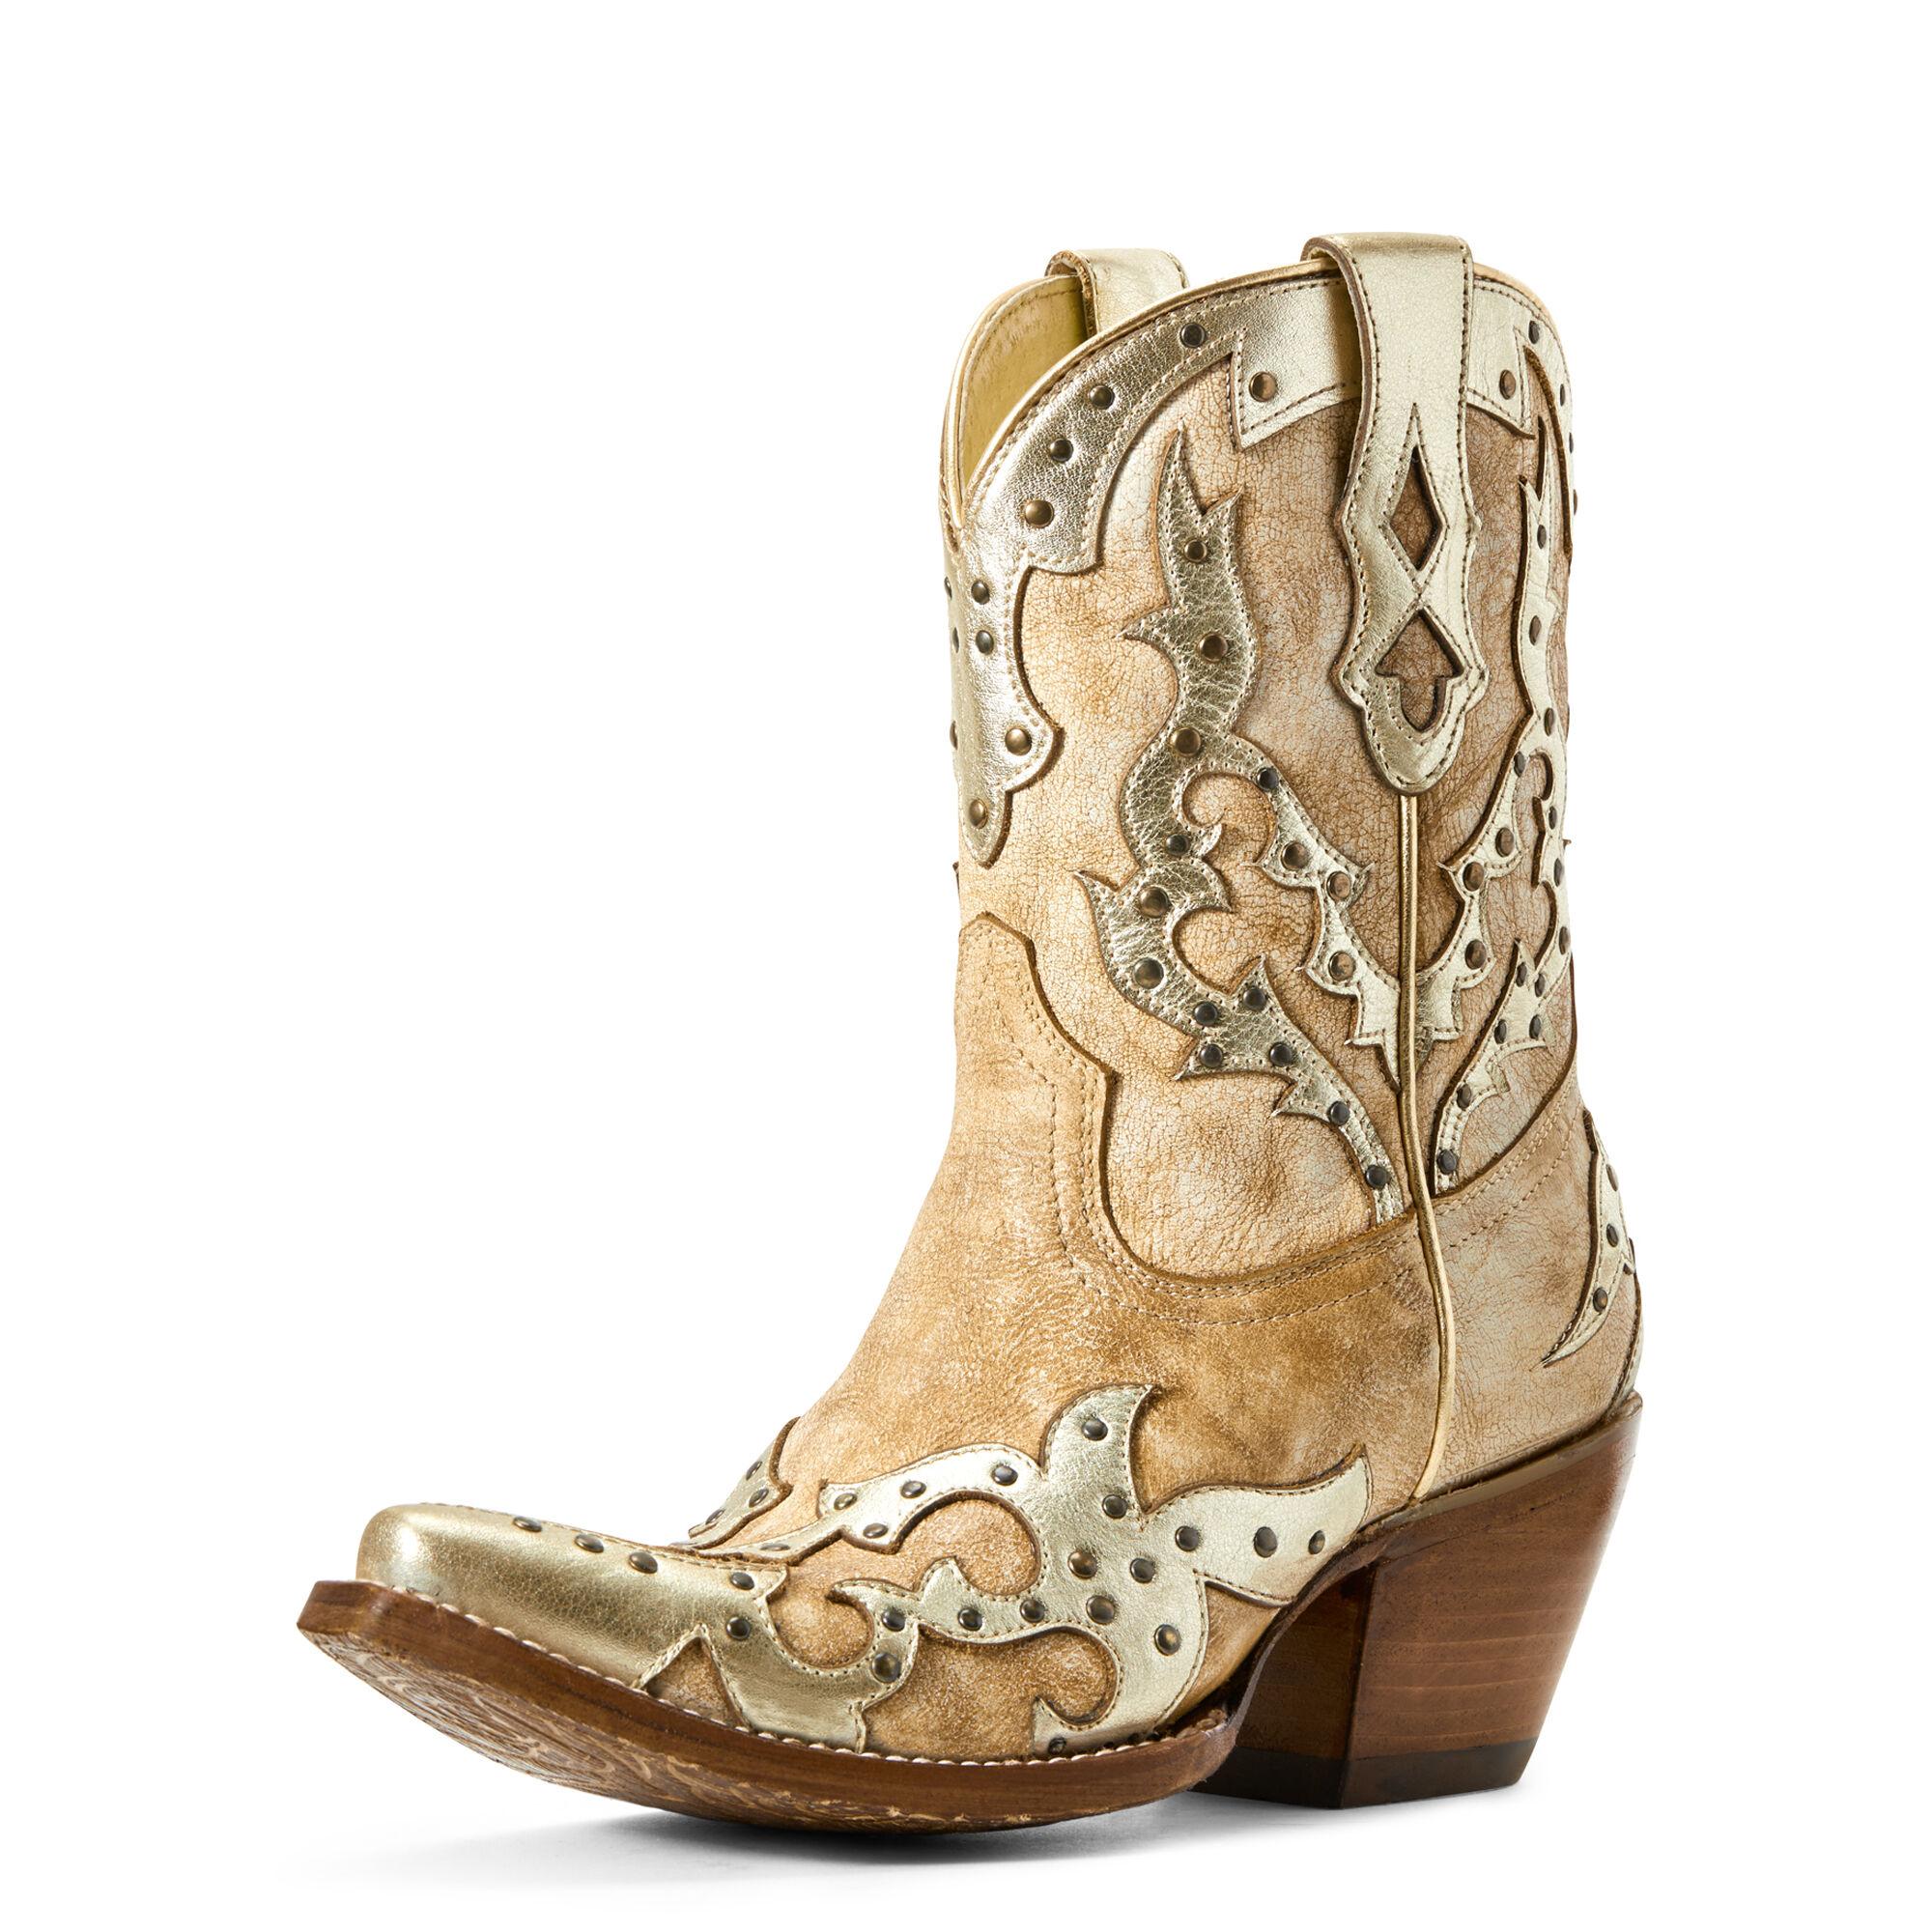 Ariat Women's Sapphire Western Boots in Warm Stone